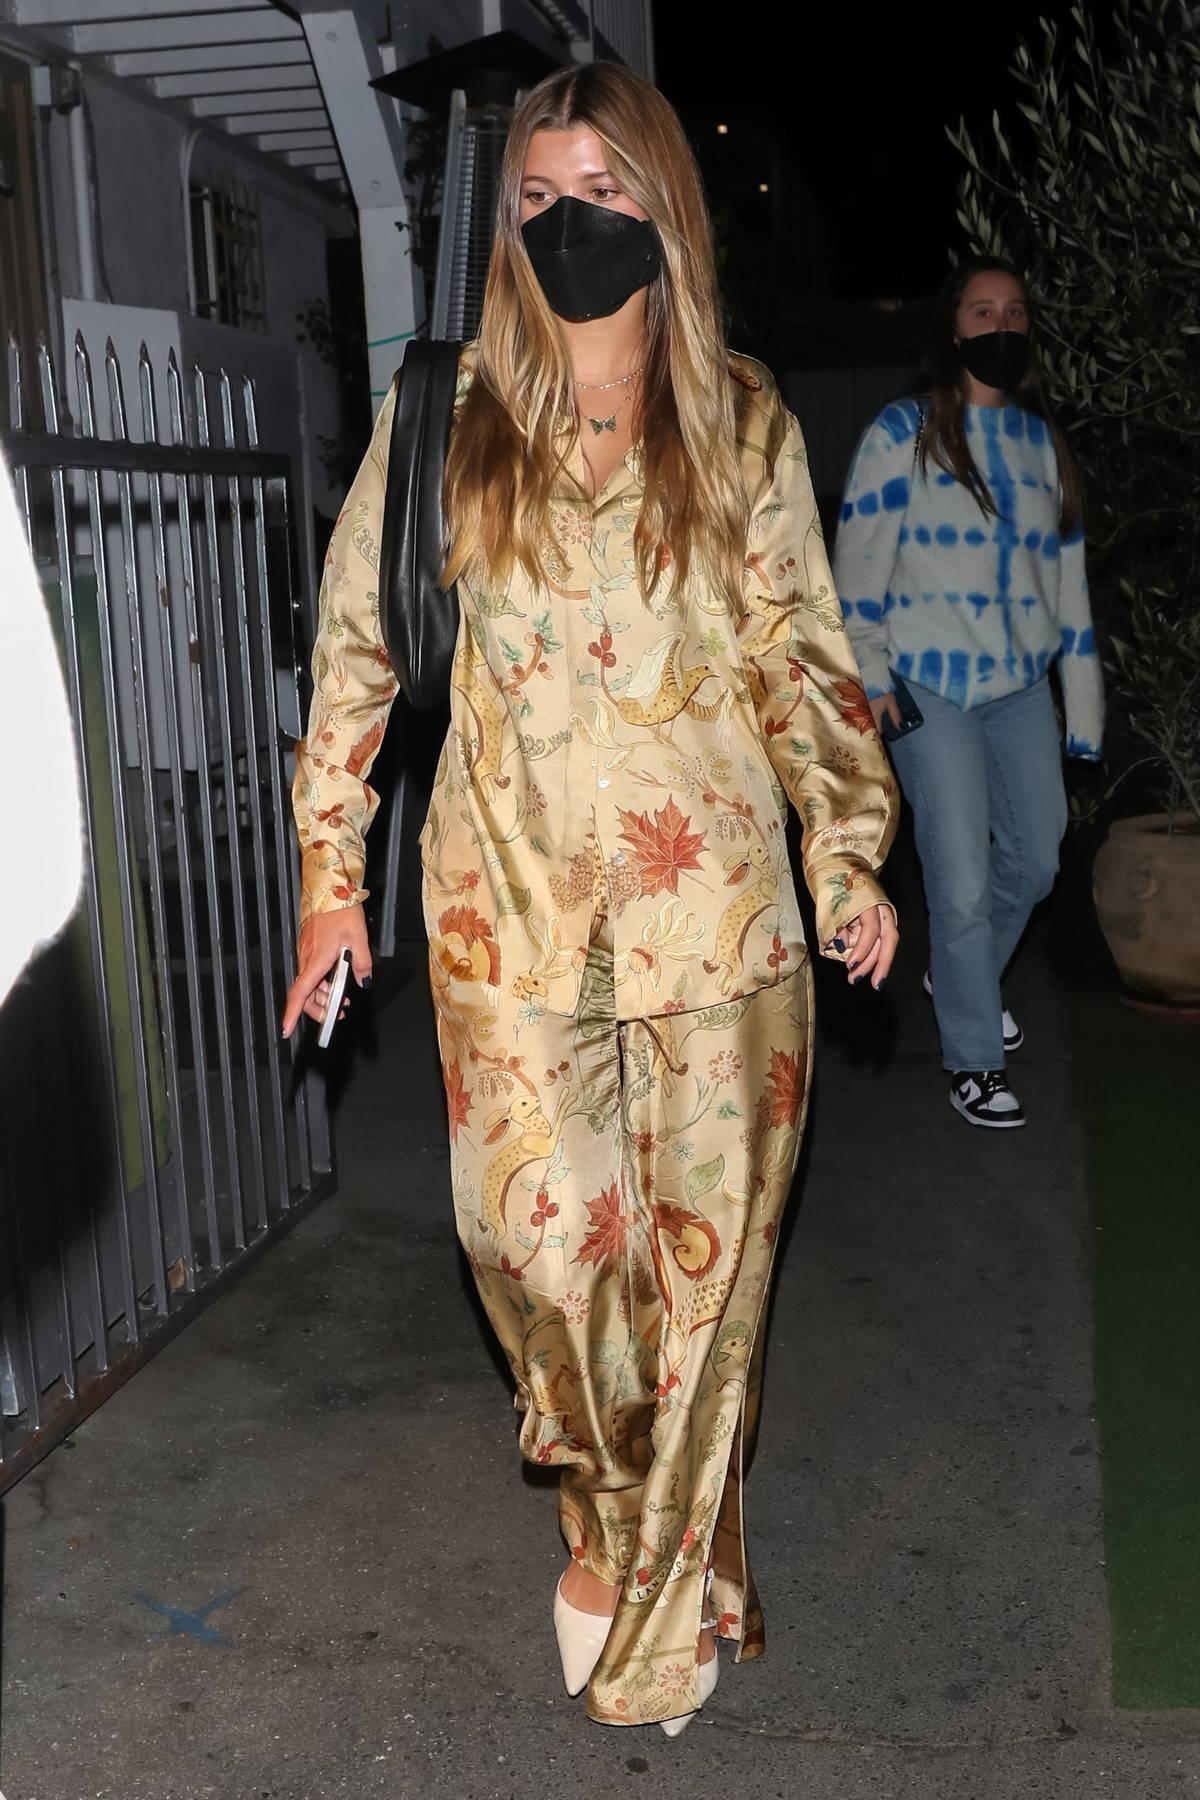 Sofia Richie dons a floral ensemble during a dinner date with boyfriend Elliot Grainge at Giorgio Baldi in Santa Monica, California